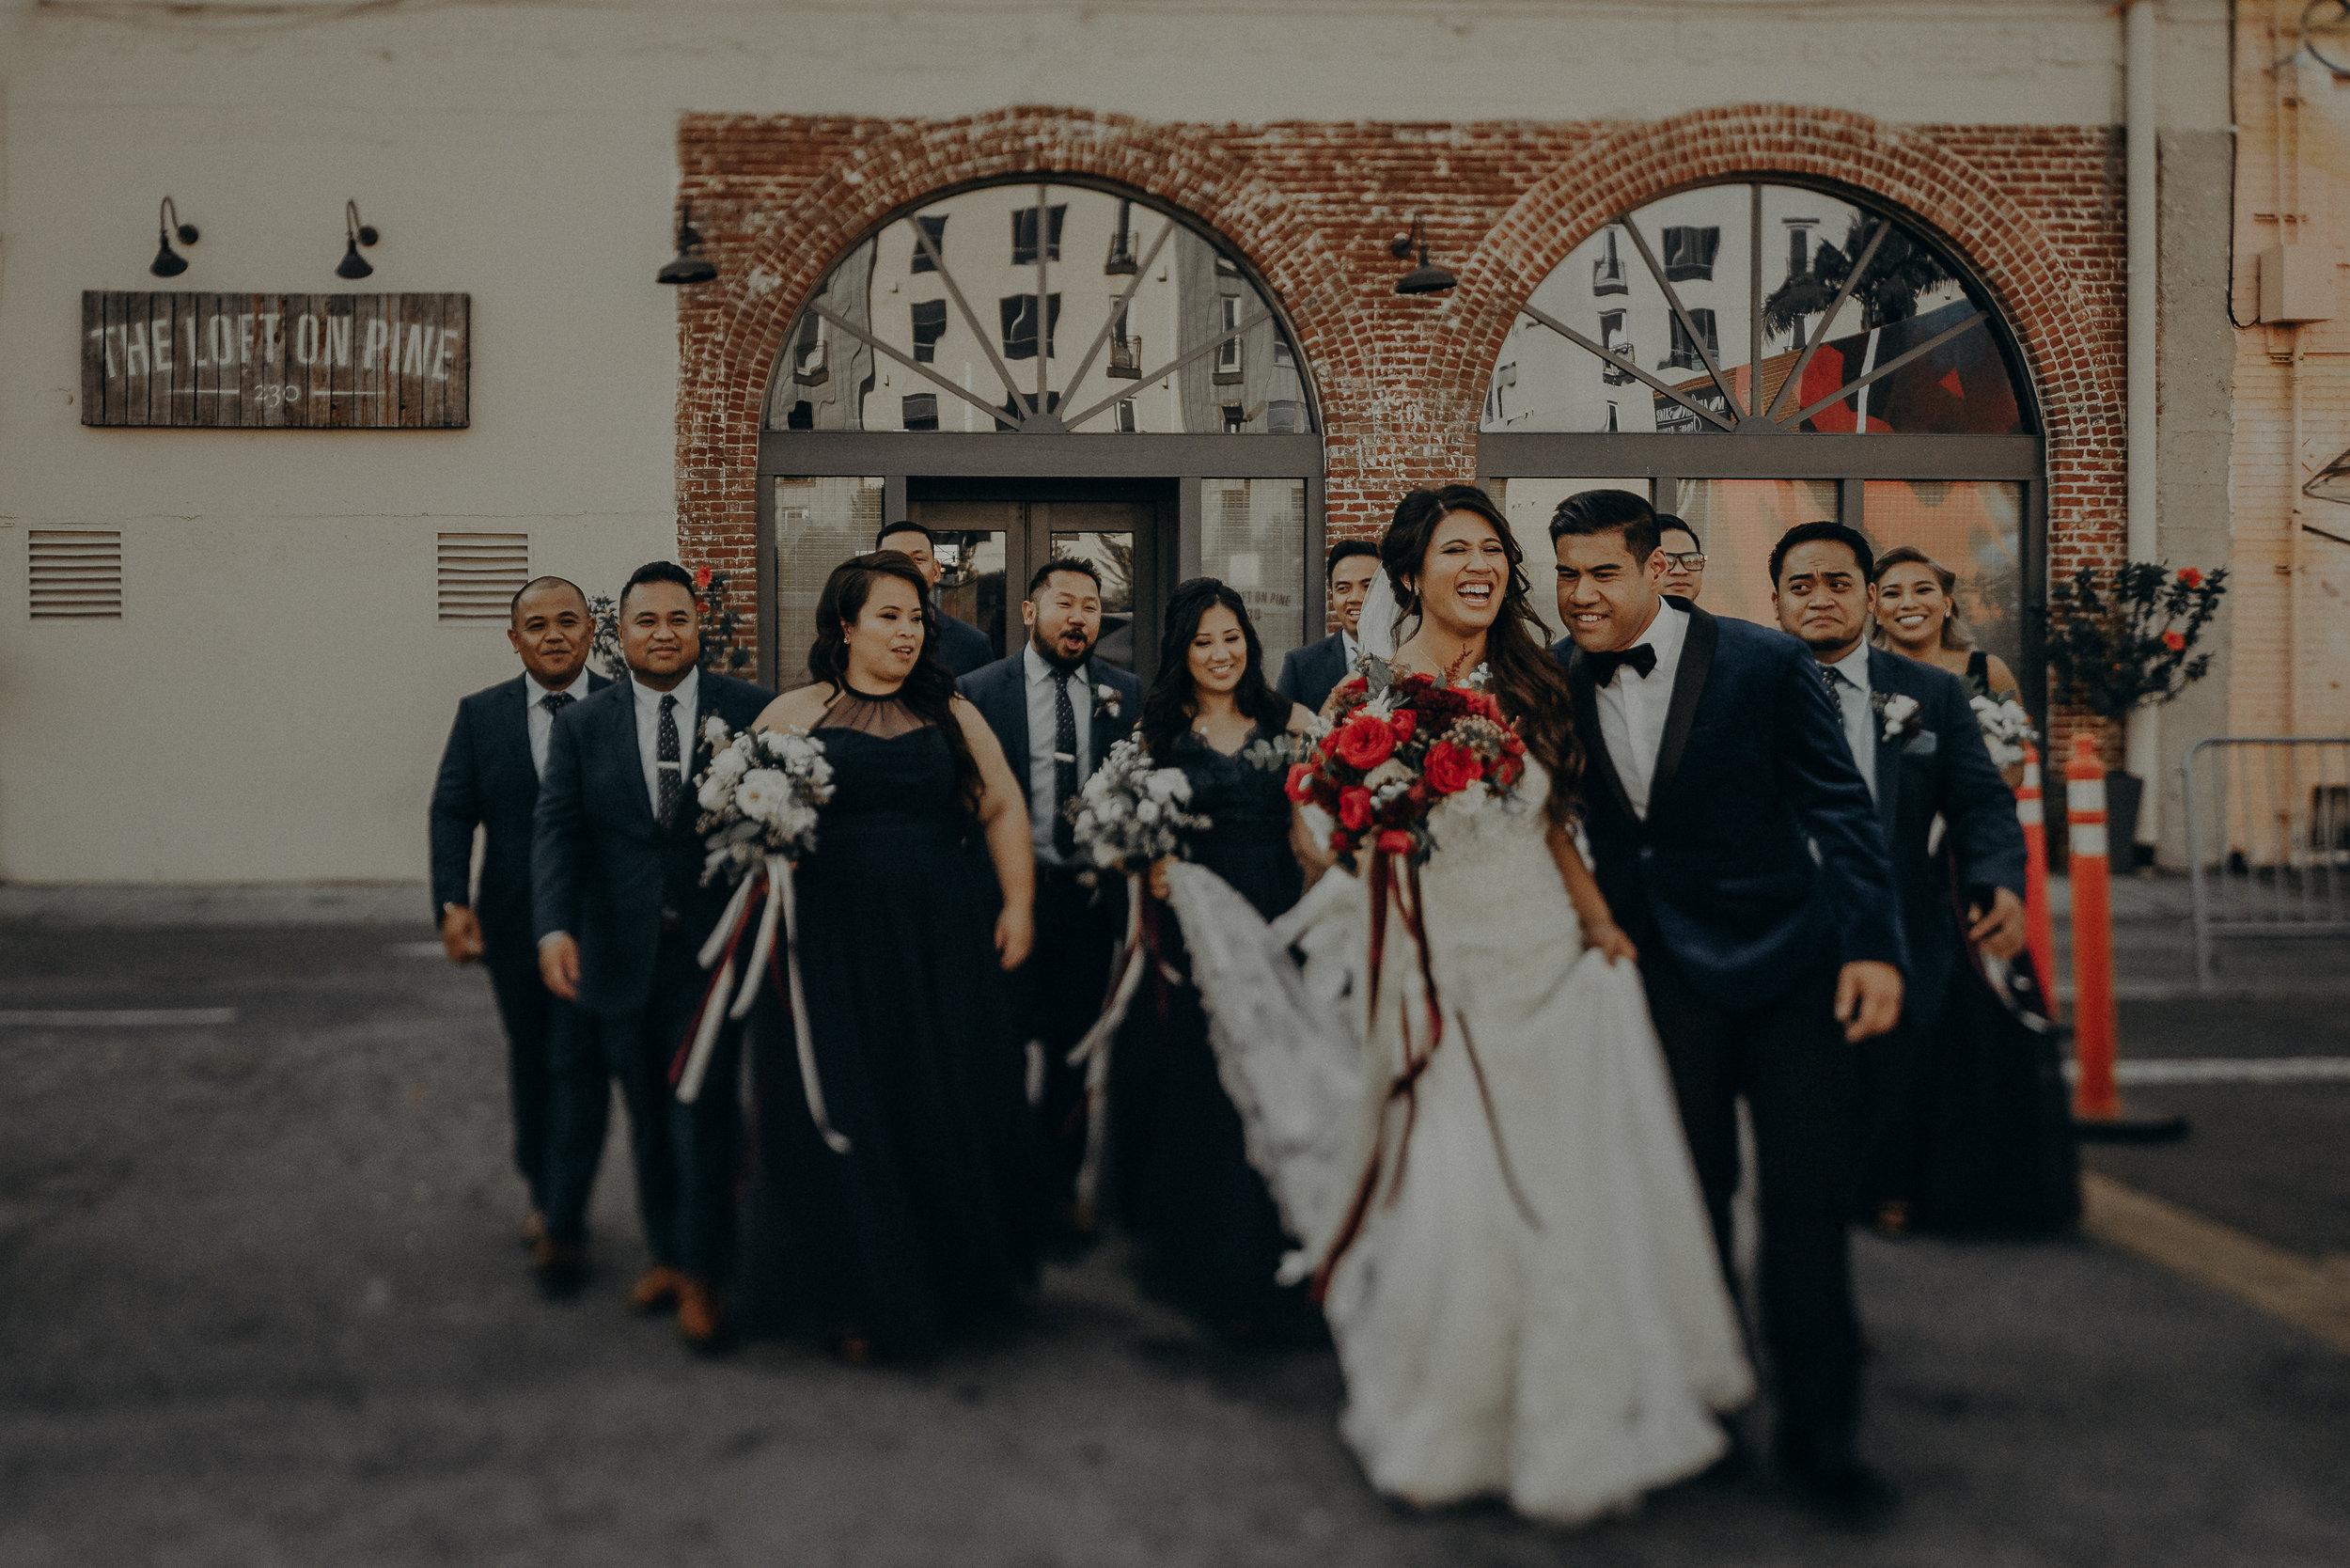 ©Isaiah + Taylor Photography - the Loft on Pine Wedding, Long Beach Wedding Photographer-035.jpg